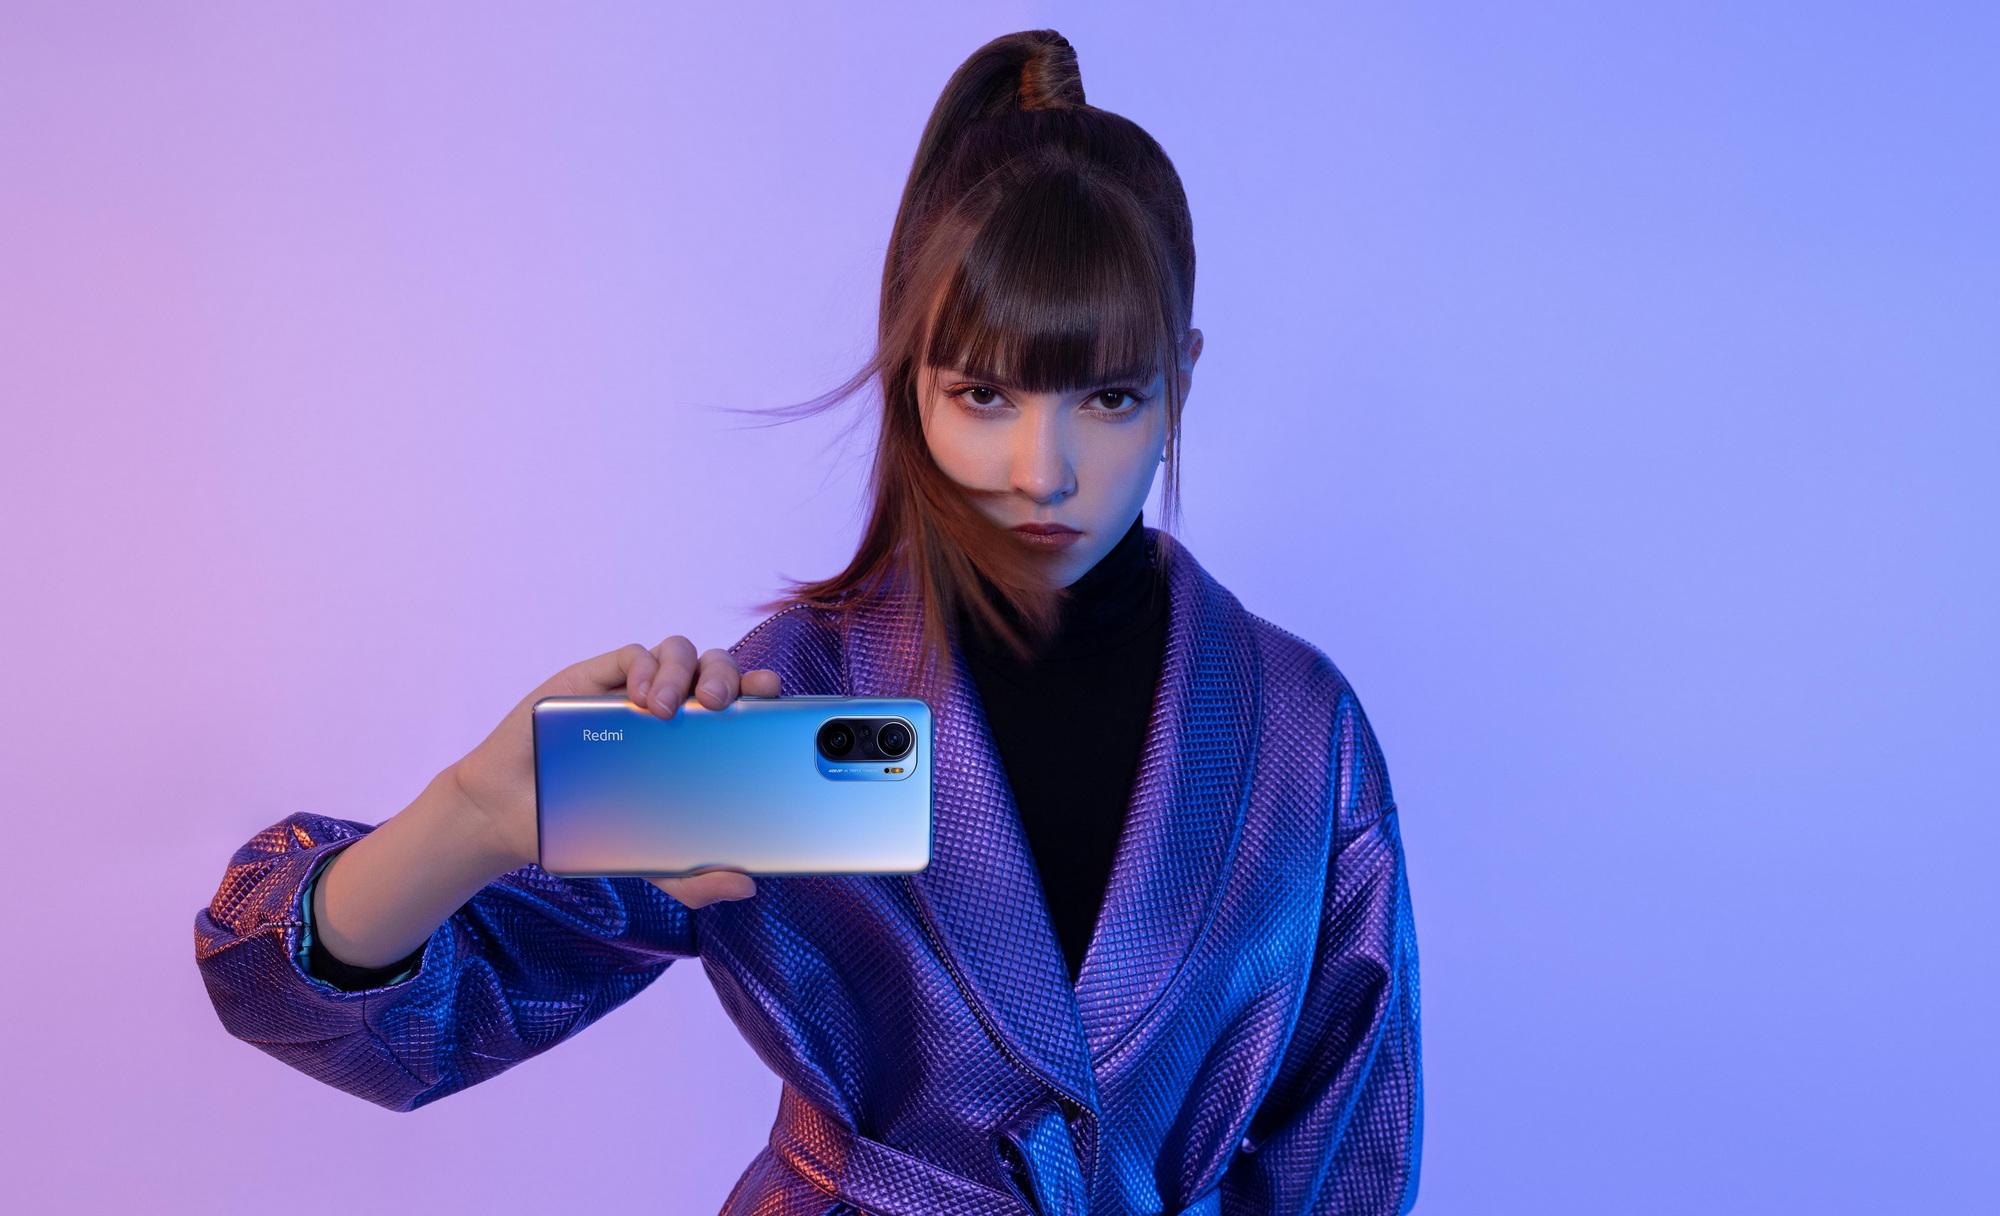 Redmi K40: флагман с чипом Snapdragon 870 и дисплеем, как у Xiaomi Mi 11 и Samsung Galaxy S21 Ultra, всего за $300